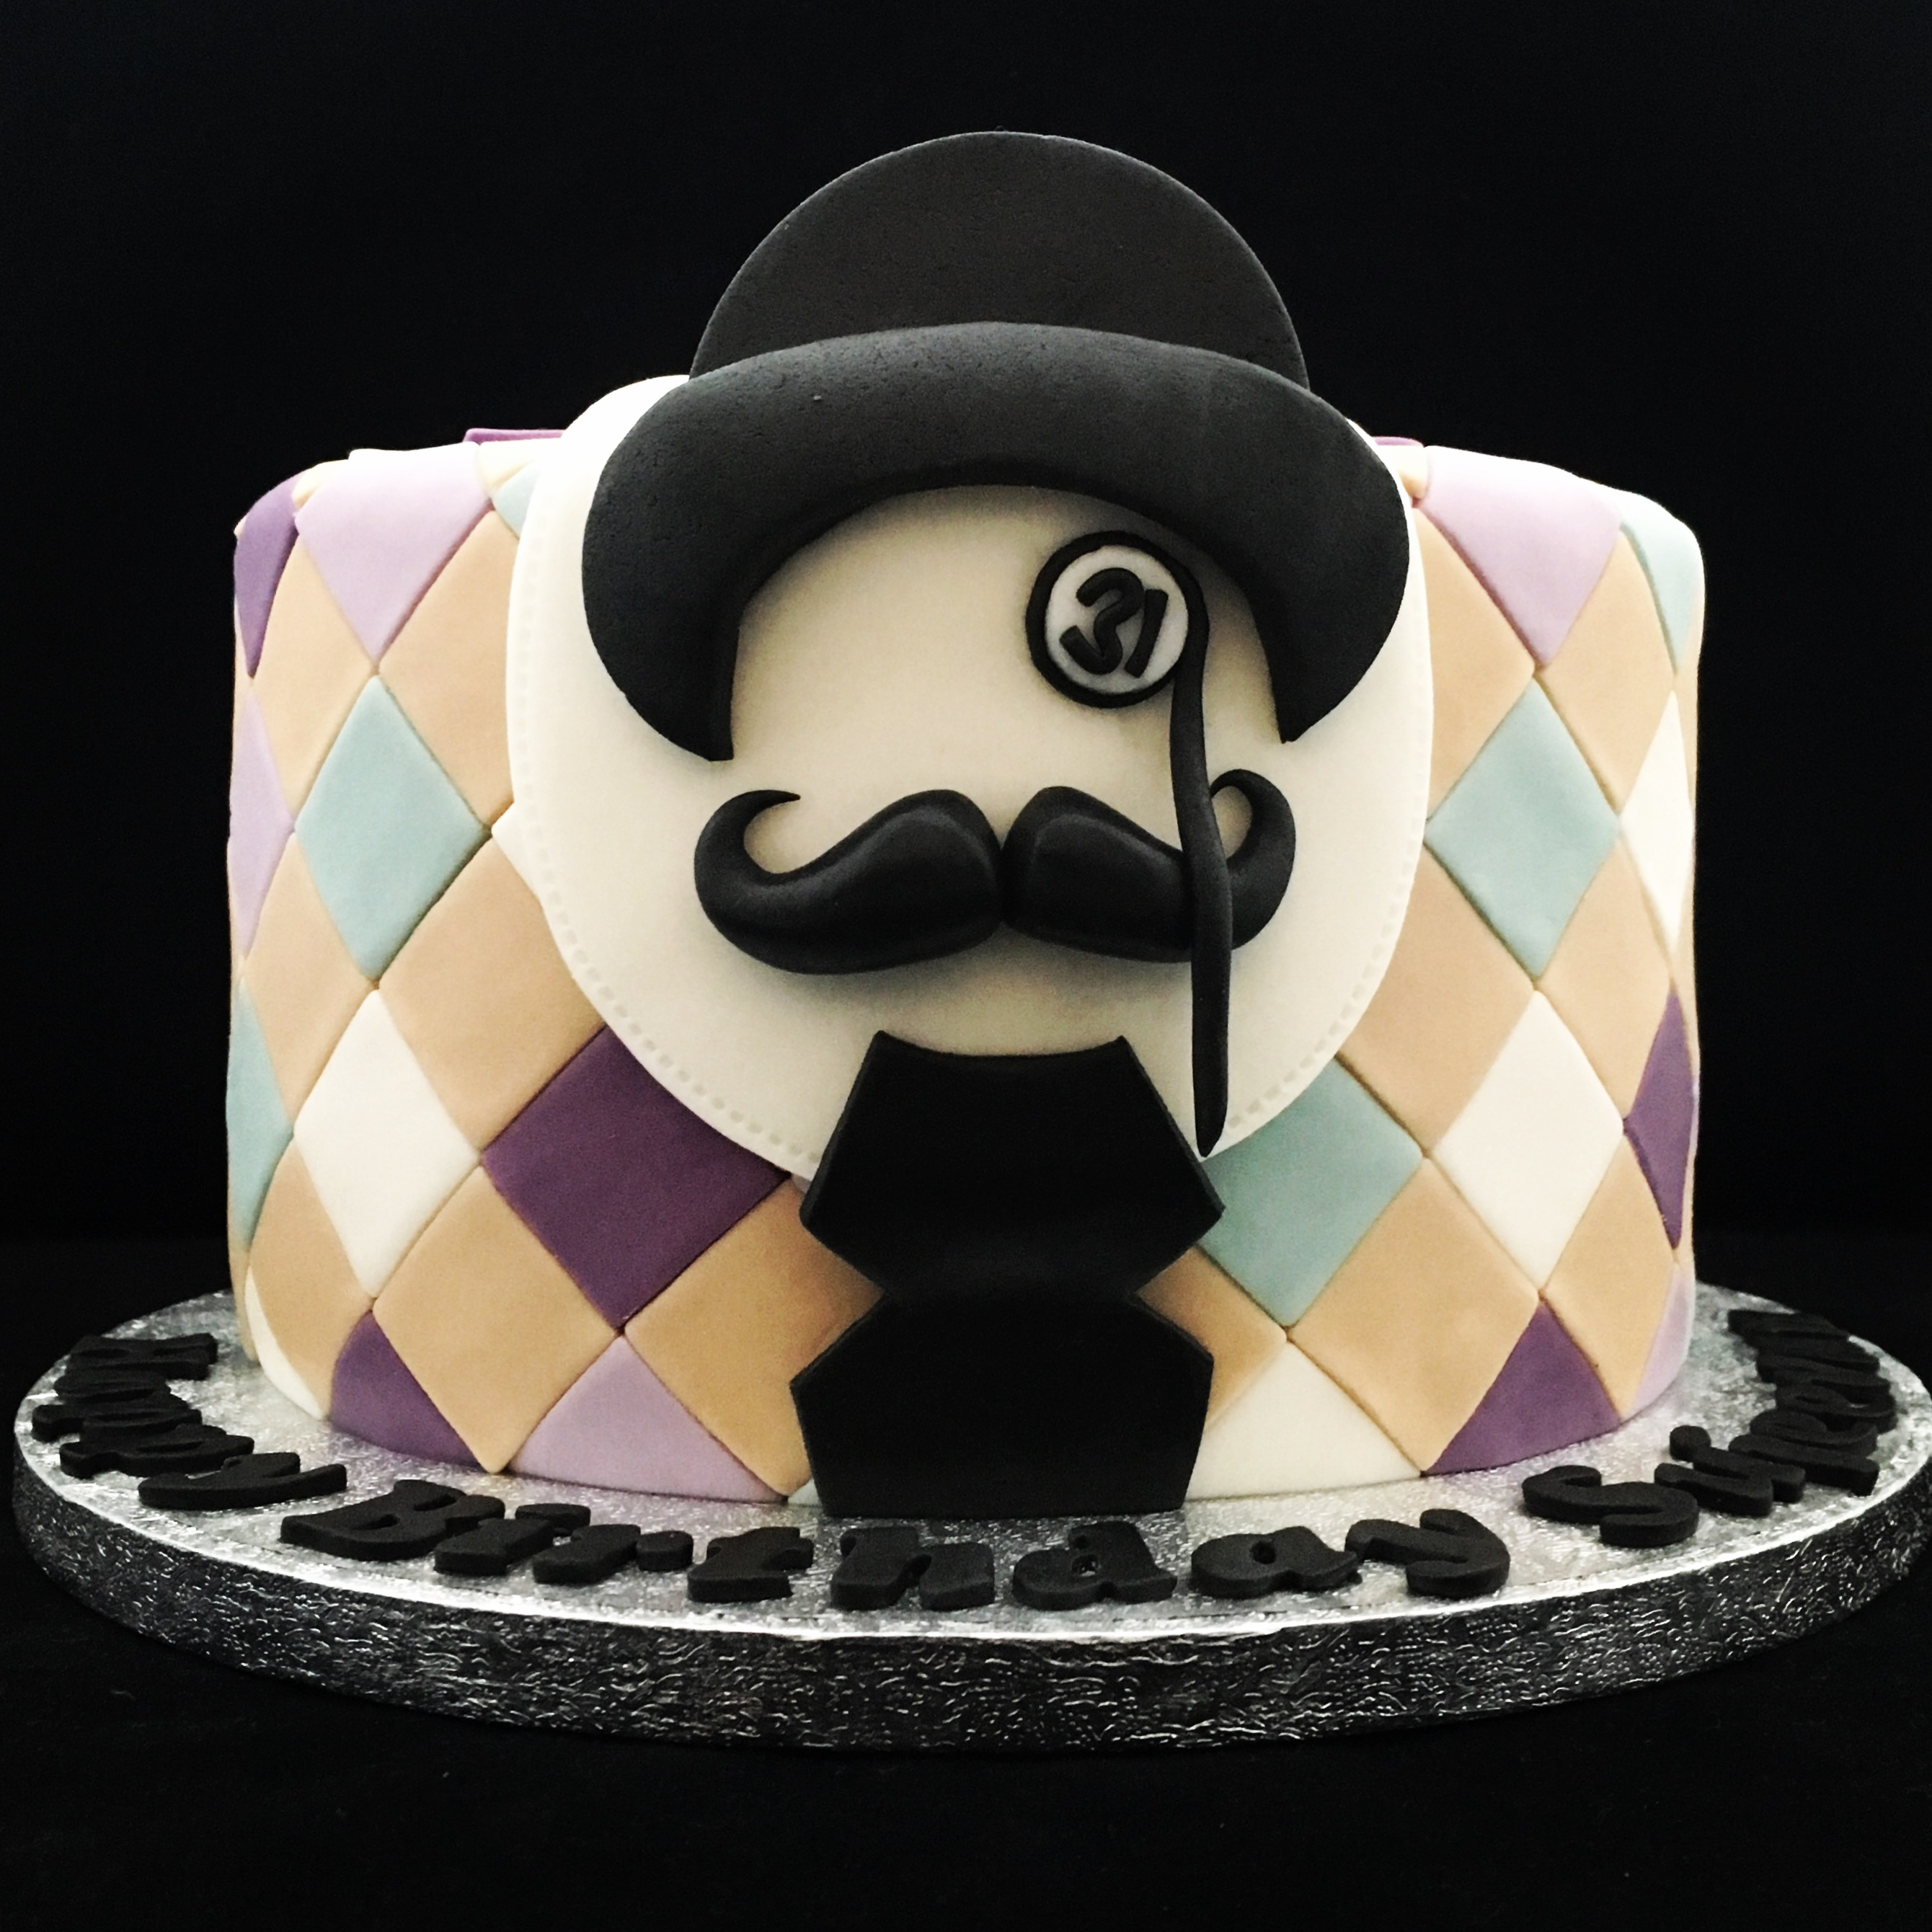 Dandy Cake